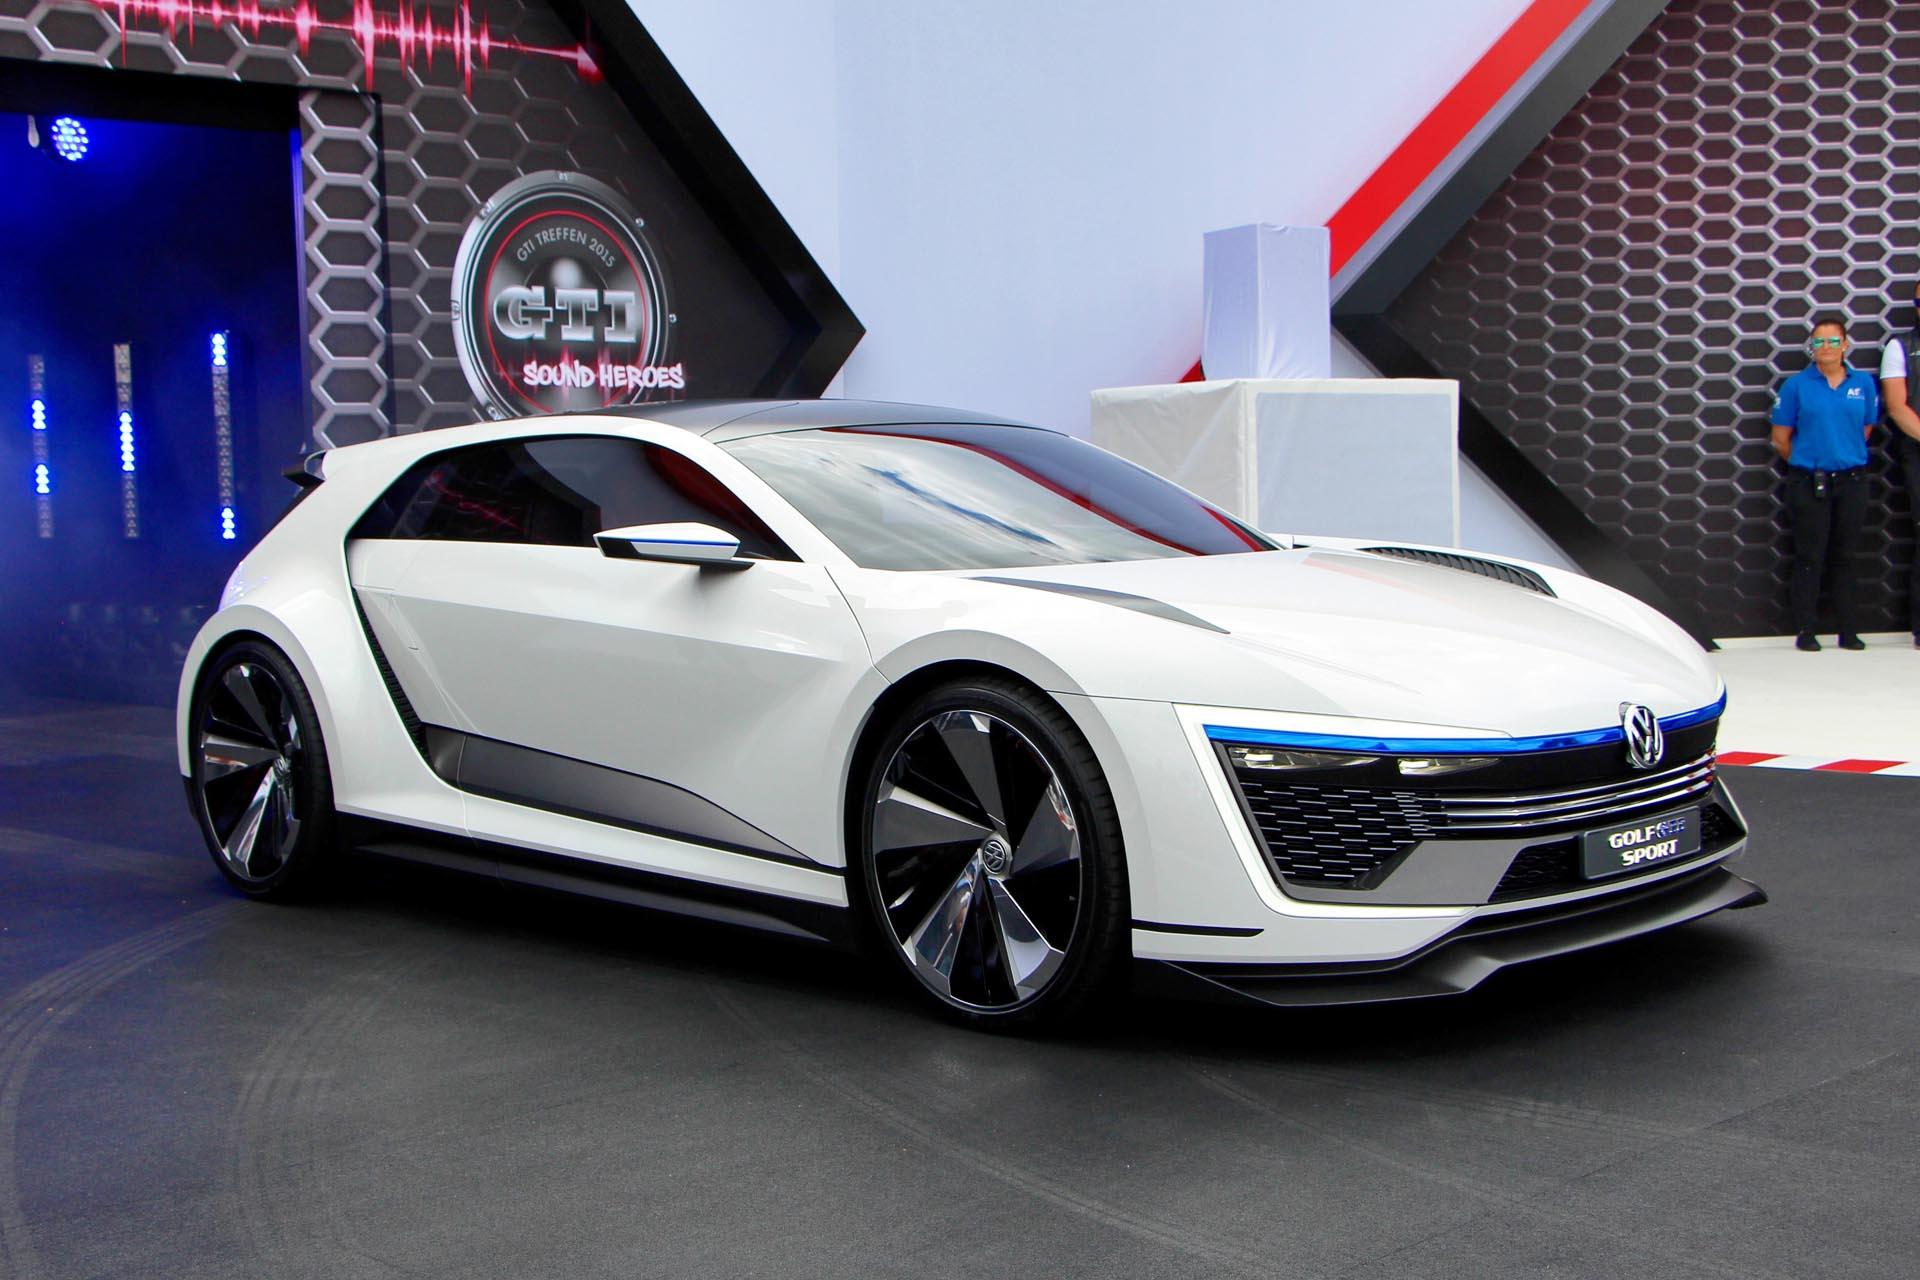 2016 Dodge Ram >> Volkswagen Golf GTE Sport Concept - Autos.ca